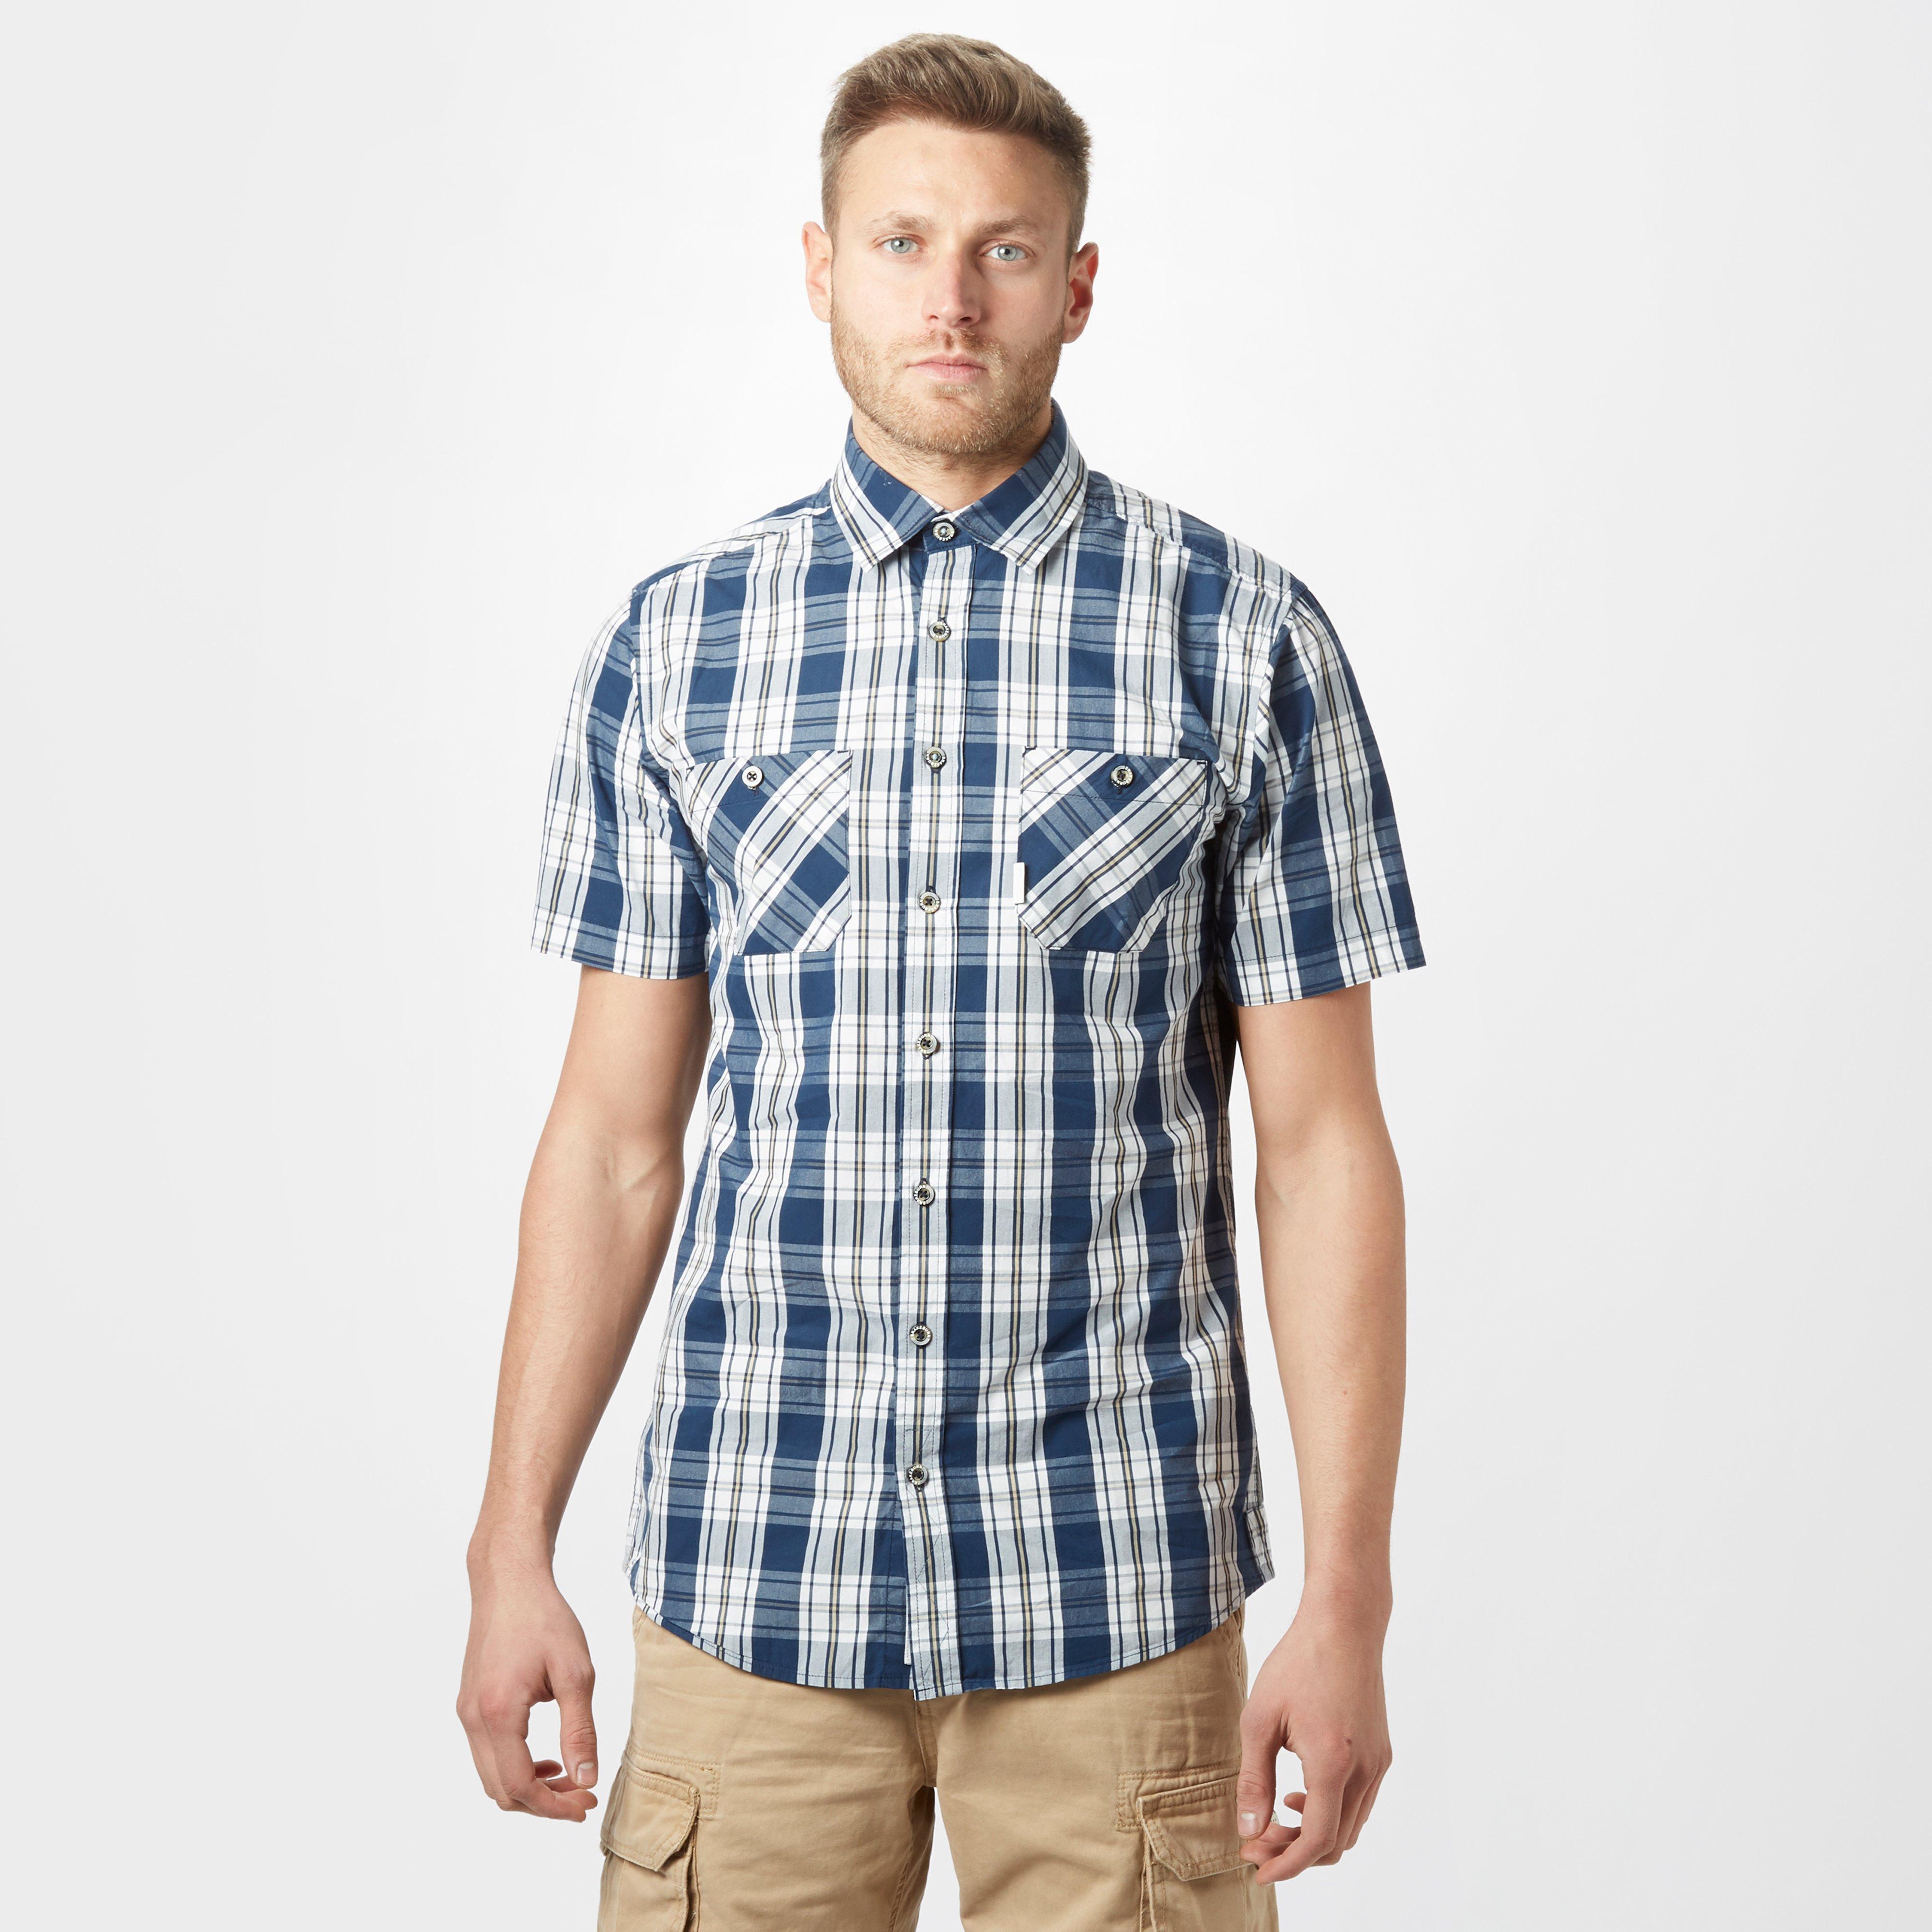 Brakeburn Mens Check Short Sleeve Shirt - Navy/nvy  Navy/nvy